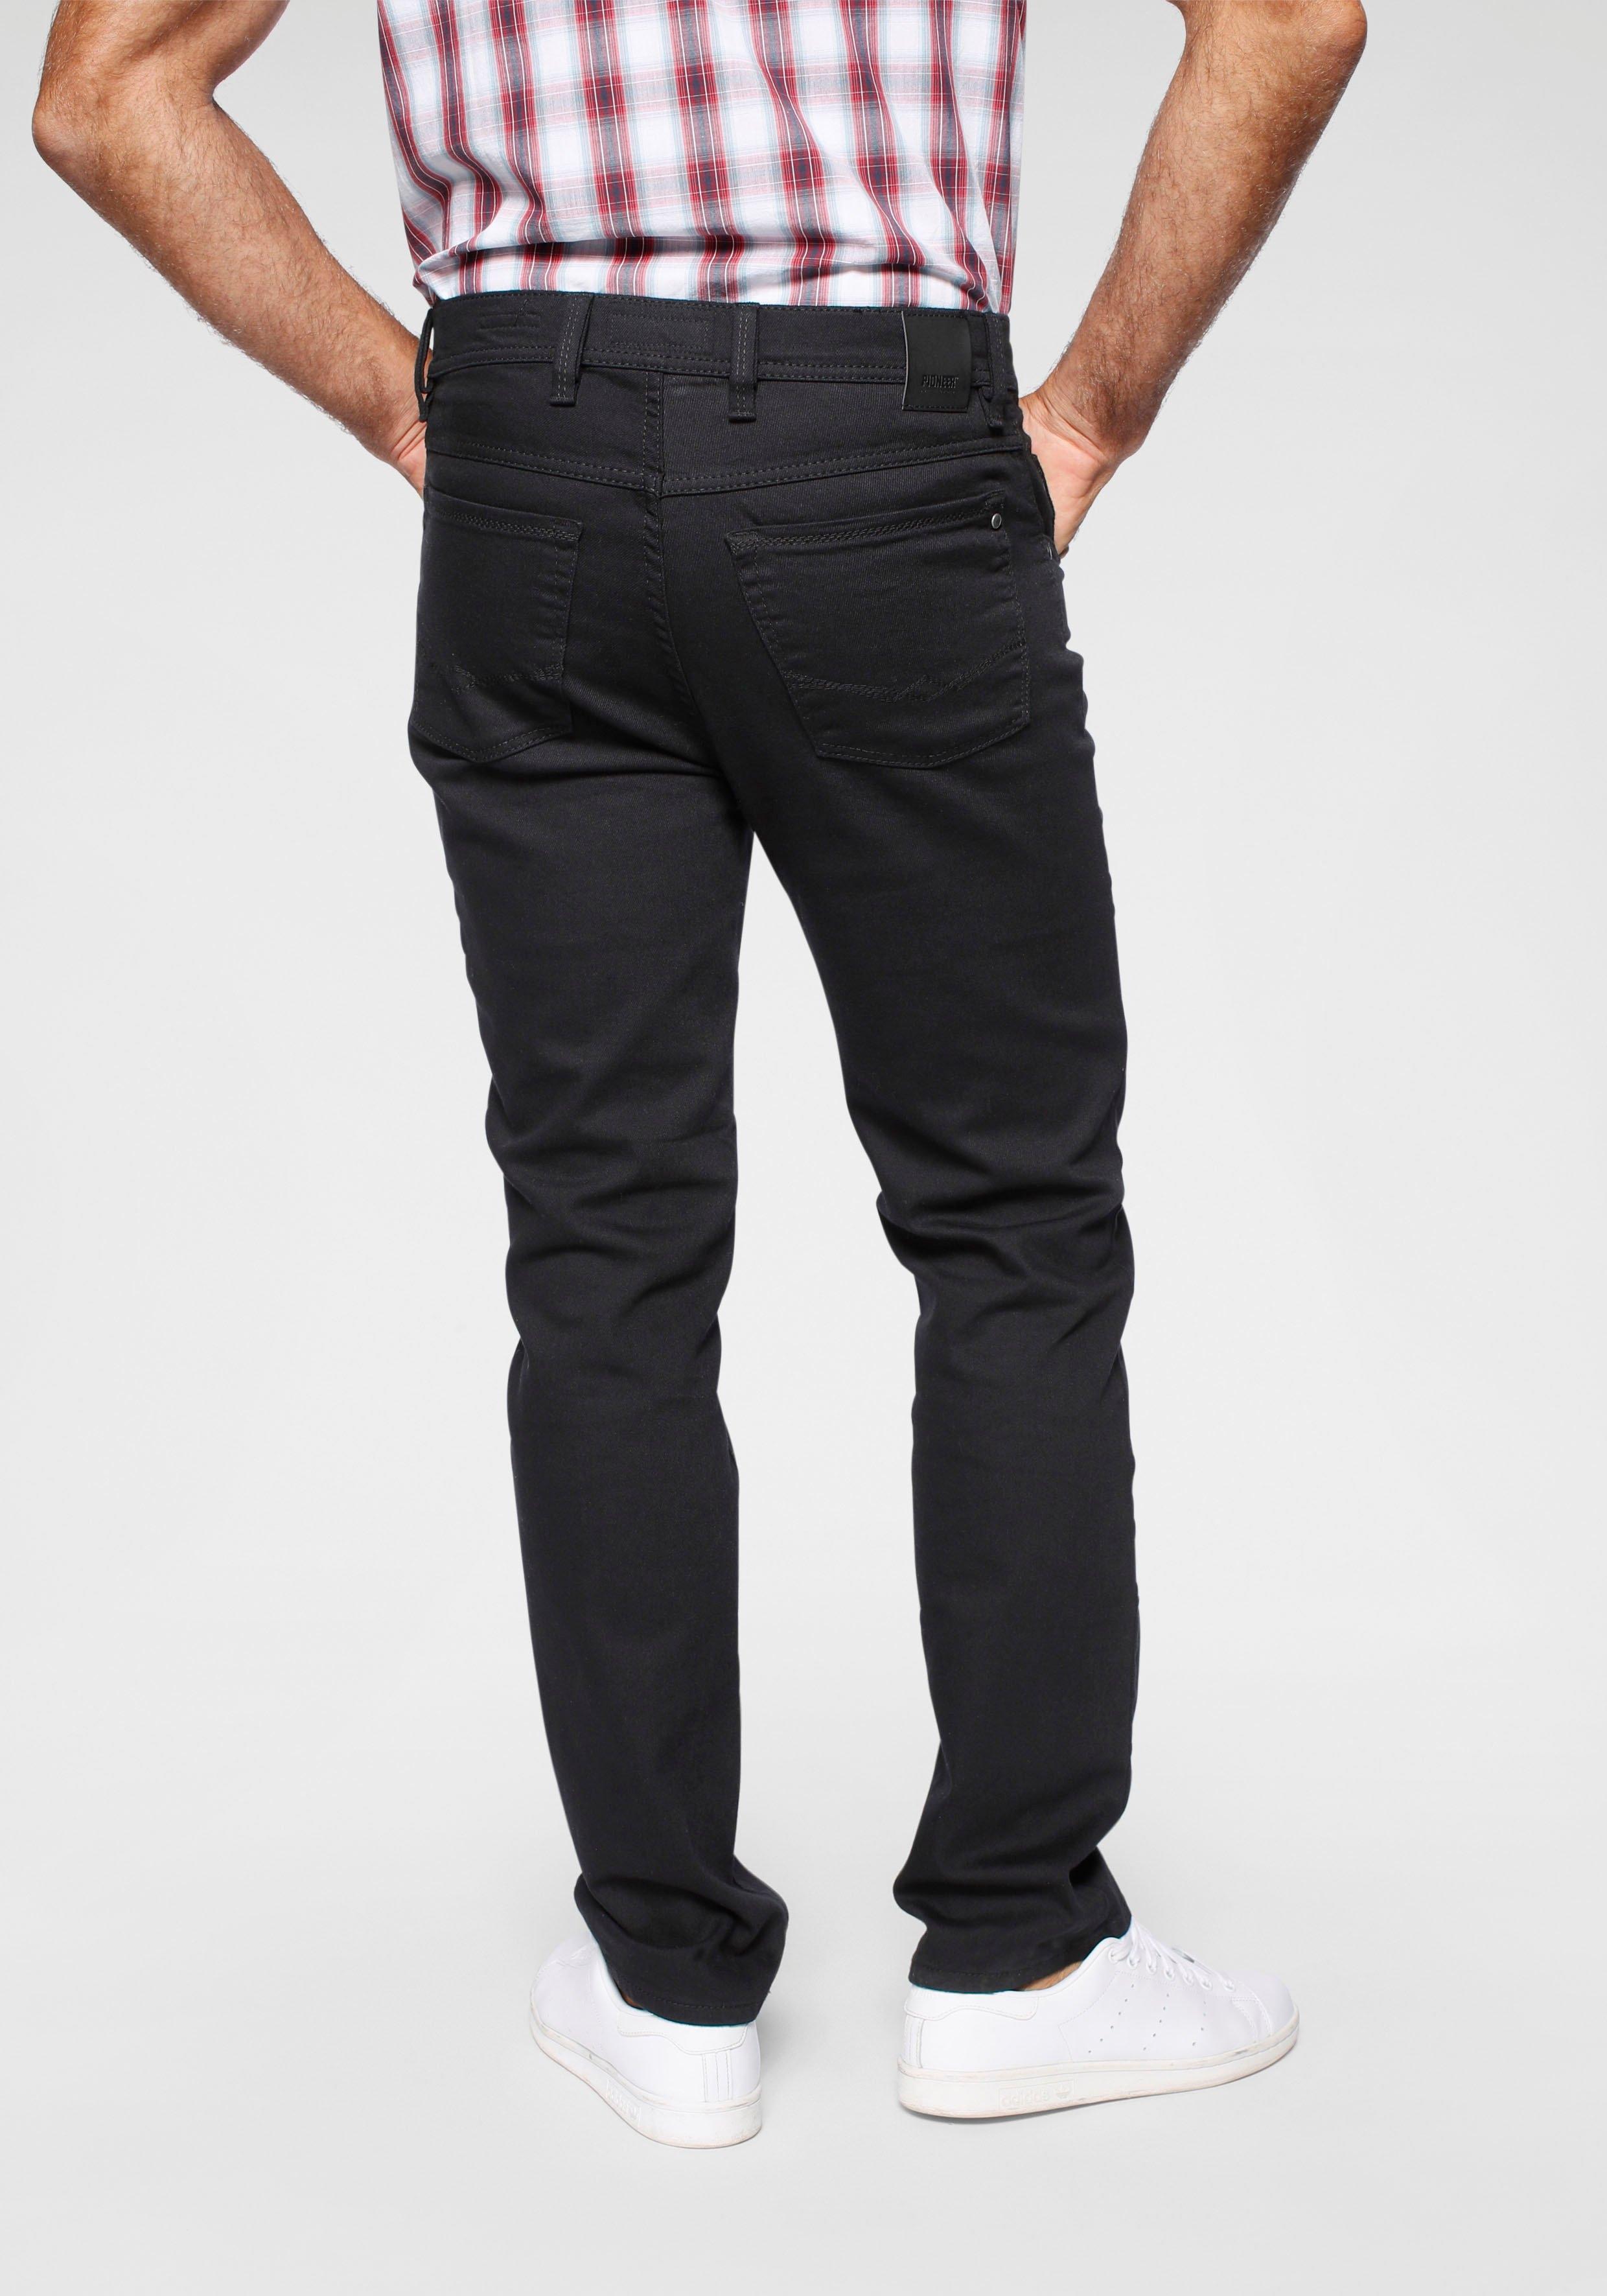 Pioneer Authentic Jeans stretch jeans goedkoop op otto.nl kopen